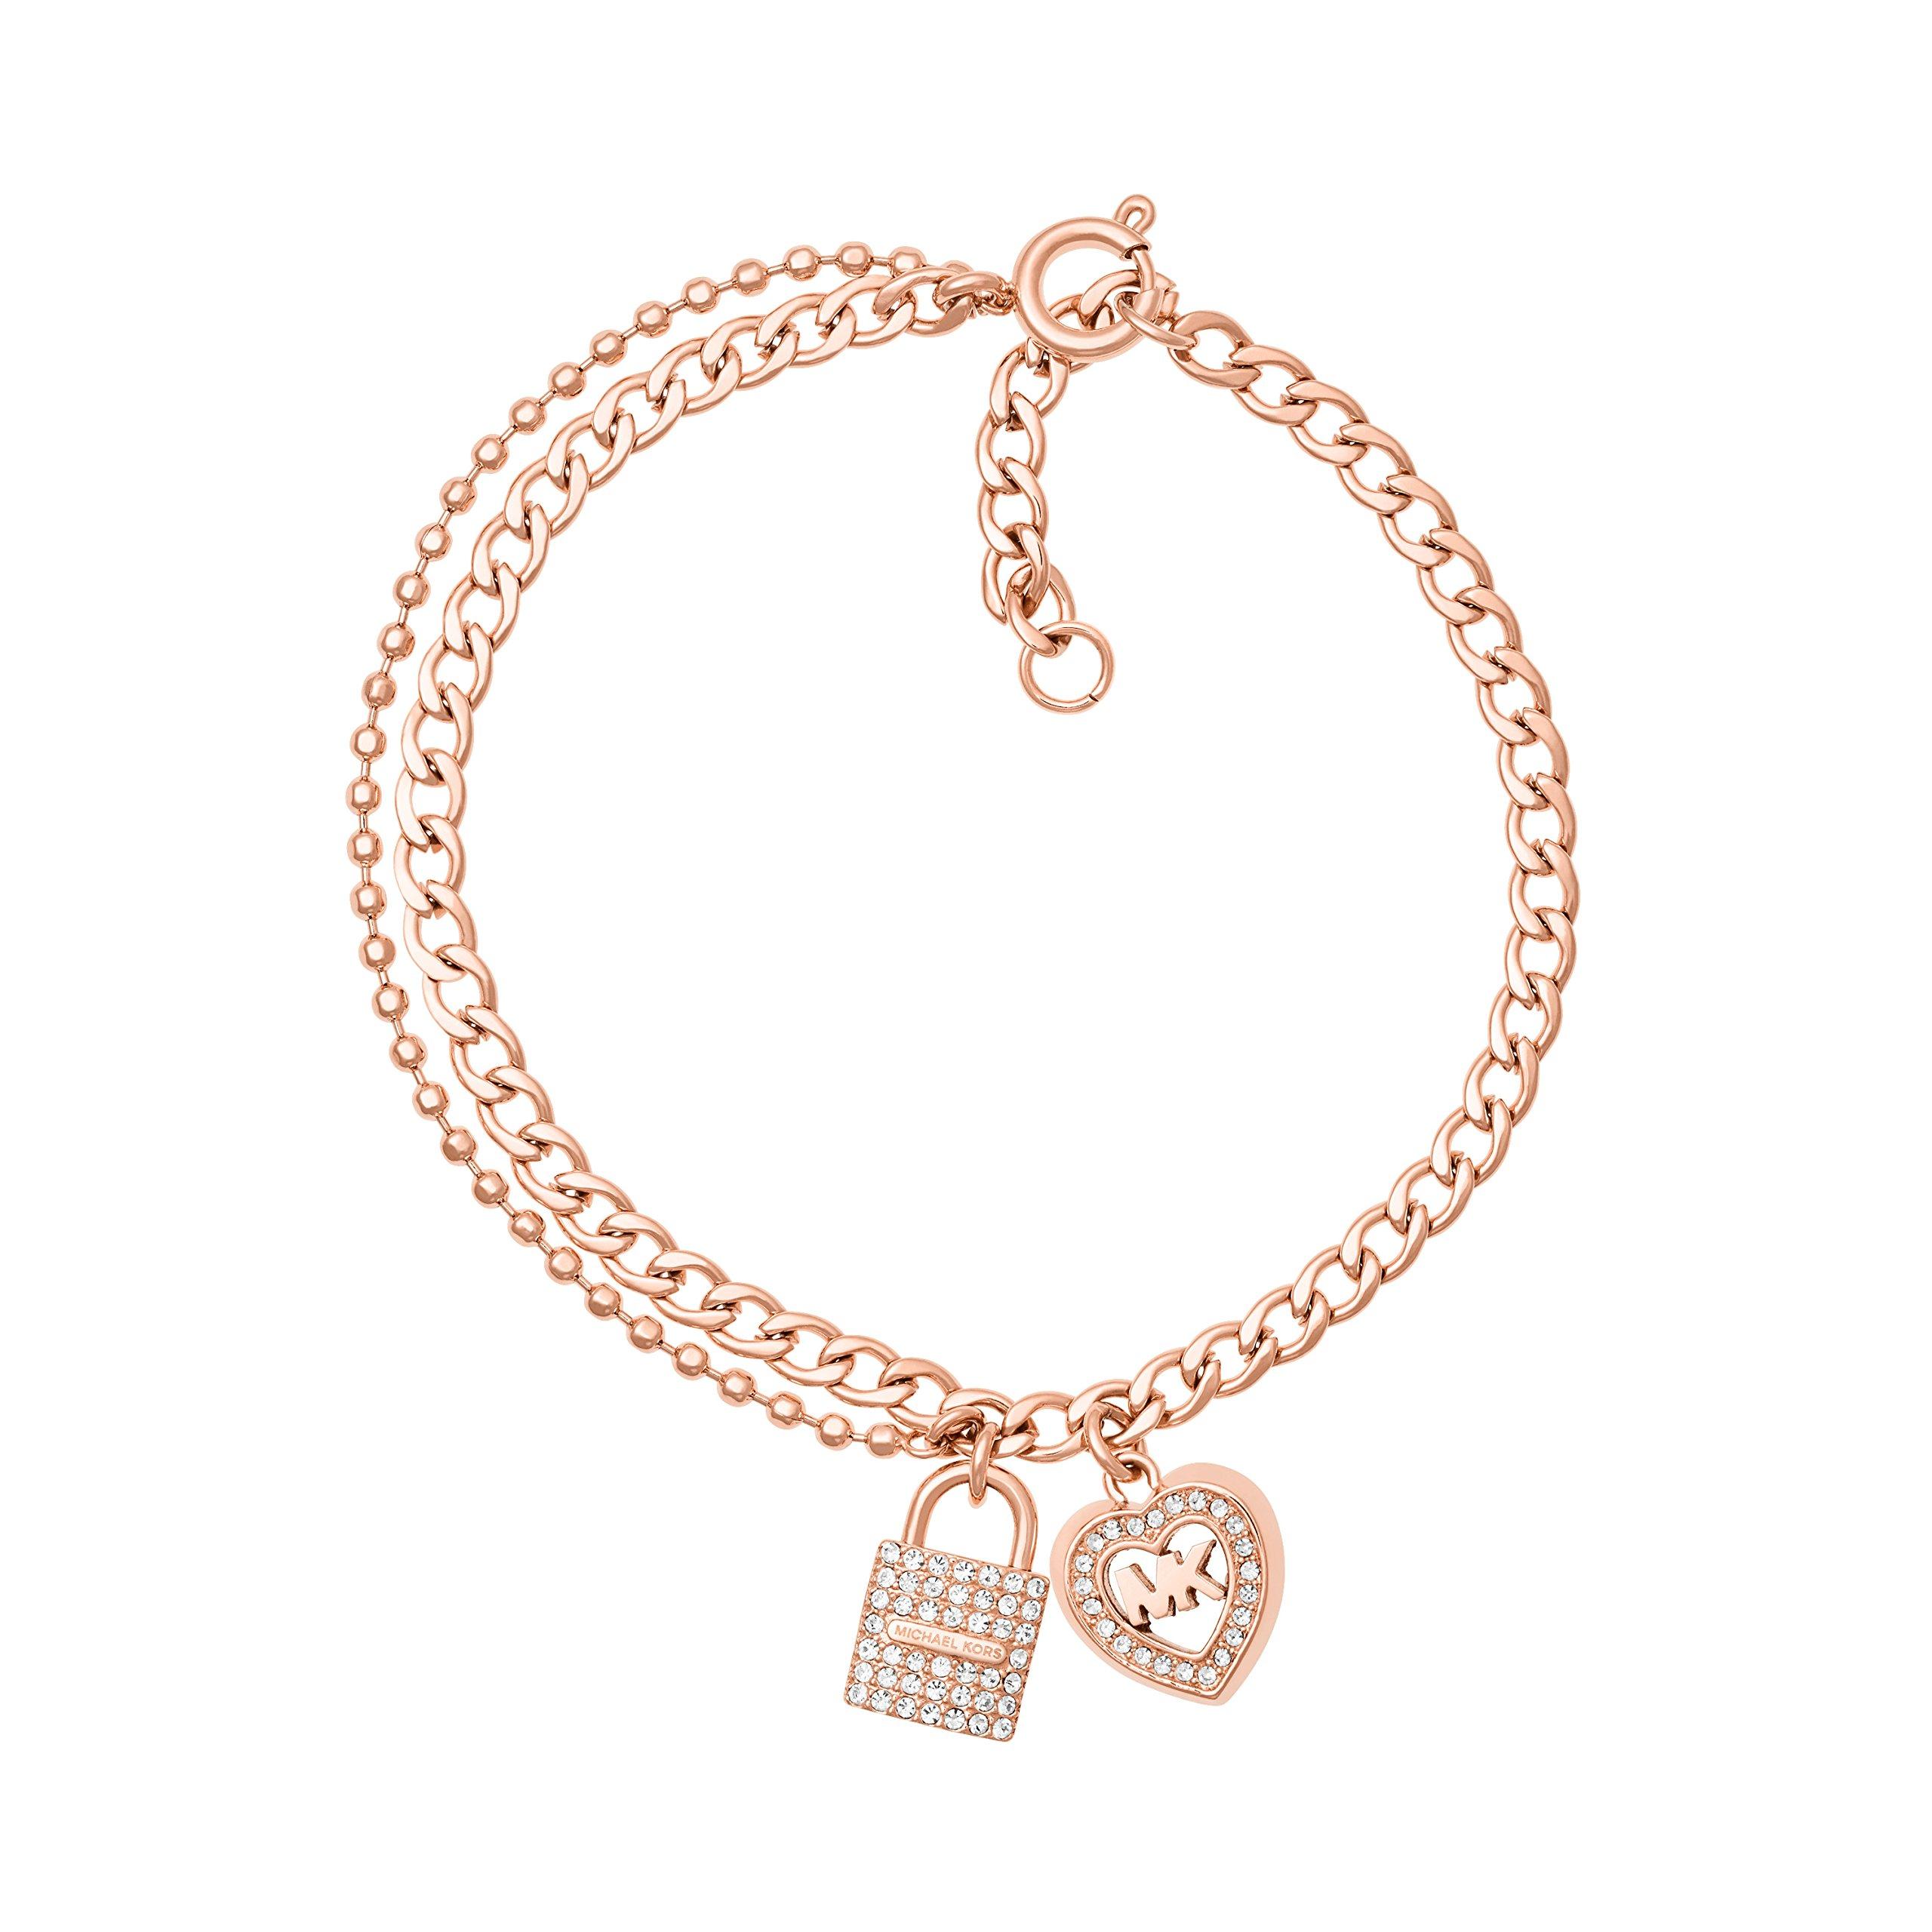 Michael Kors Womens Rose Gold-Tone Charm Link Bracelet, One Size